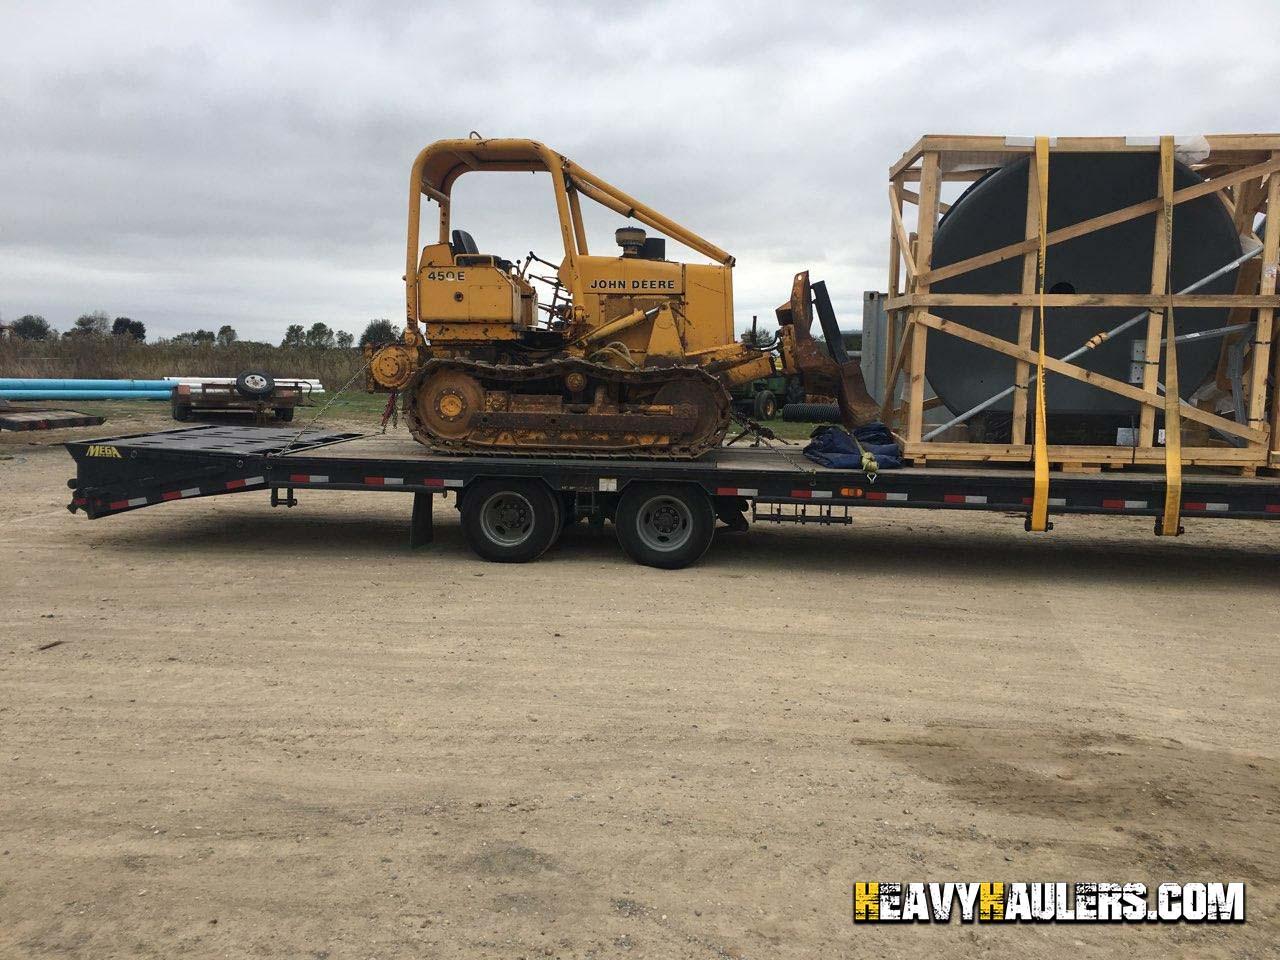 Bulldozer Transport Services   Heavy Haulers   (800) 908-6206